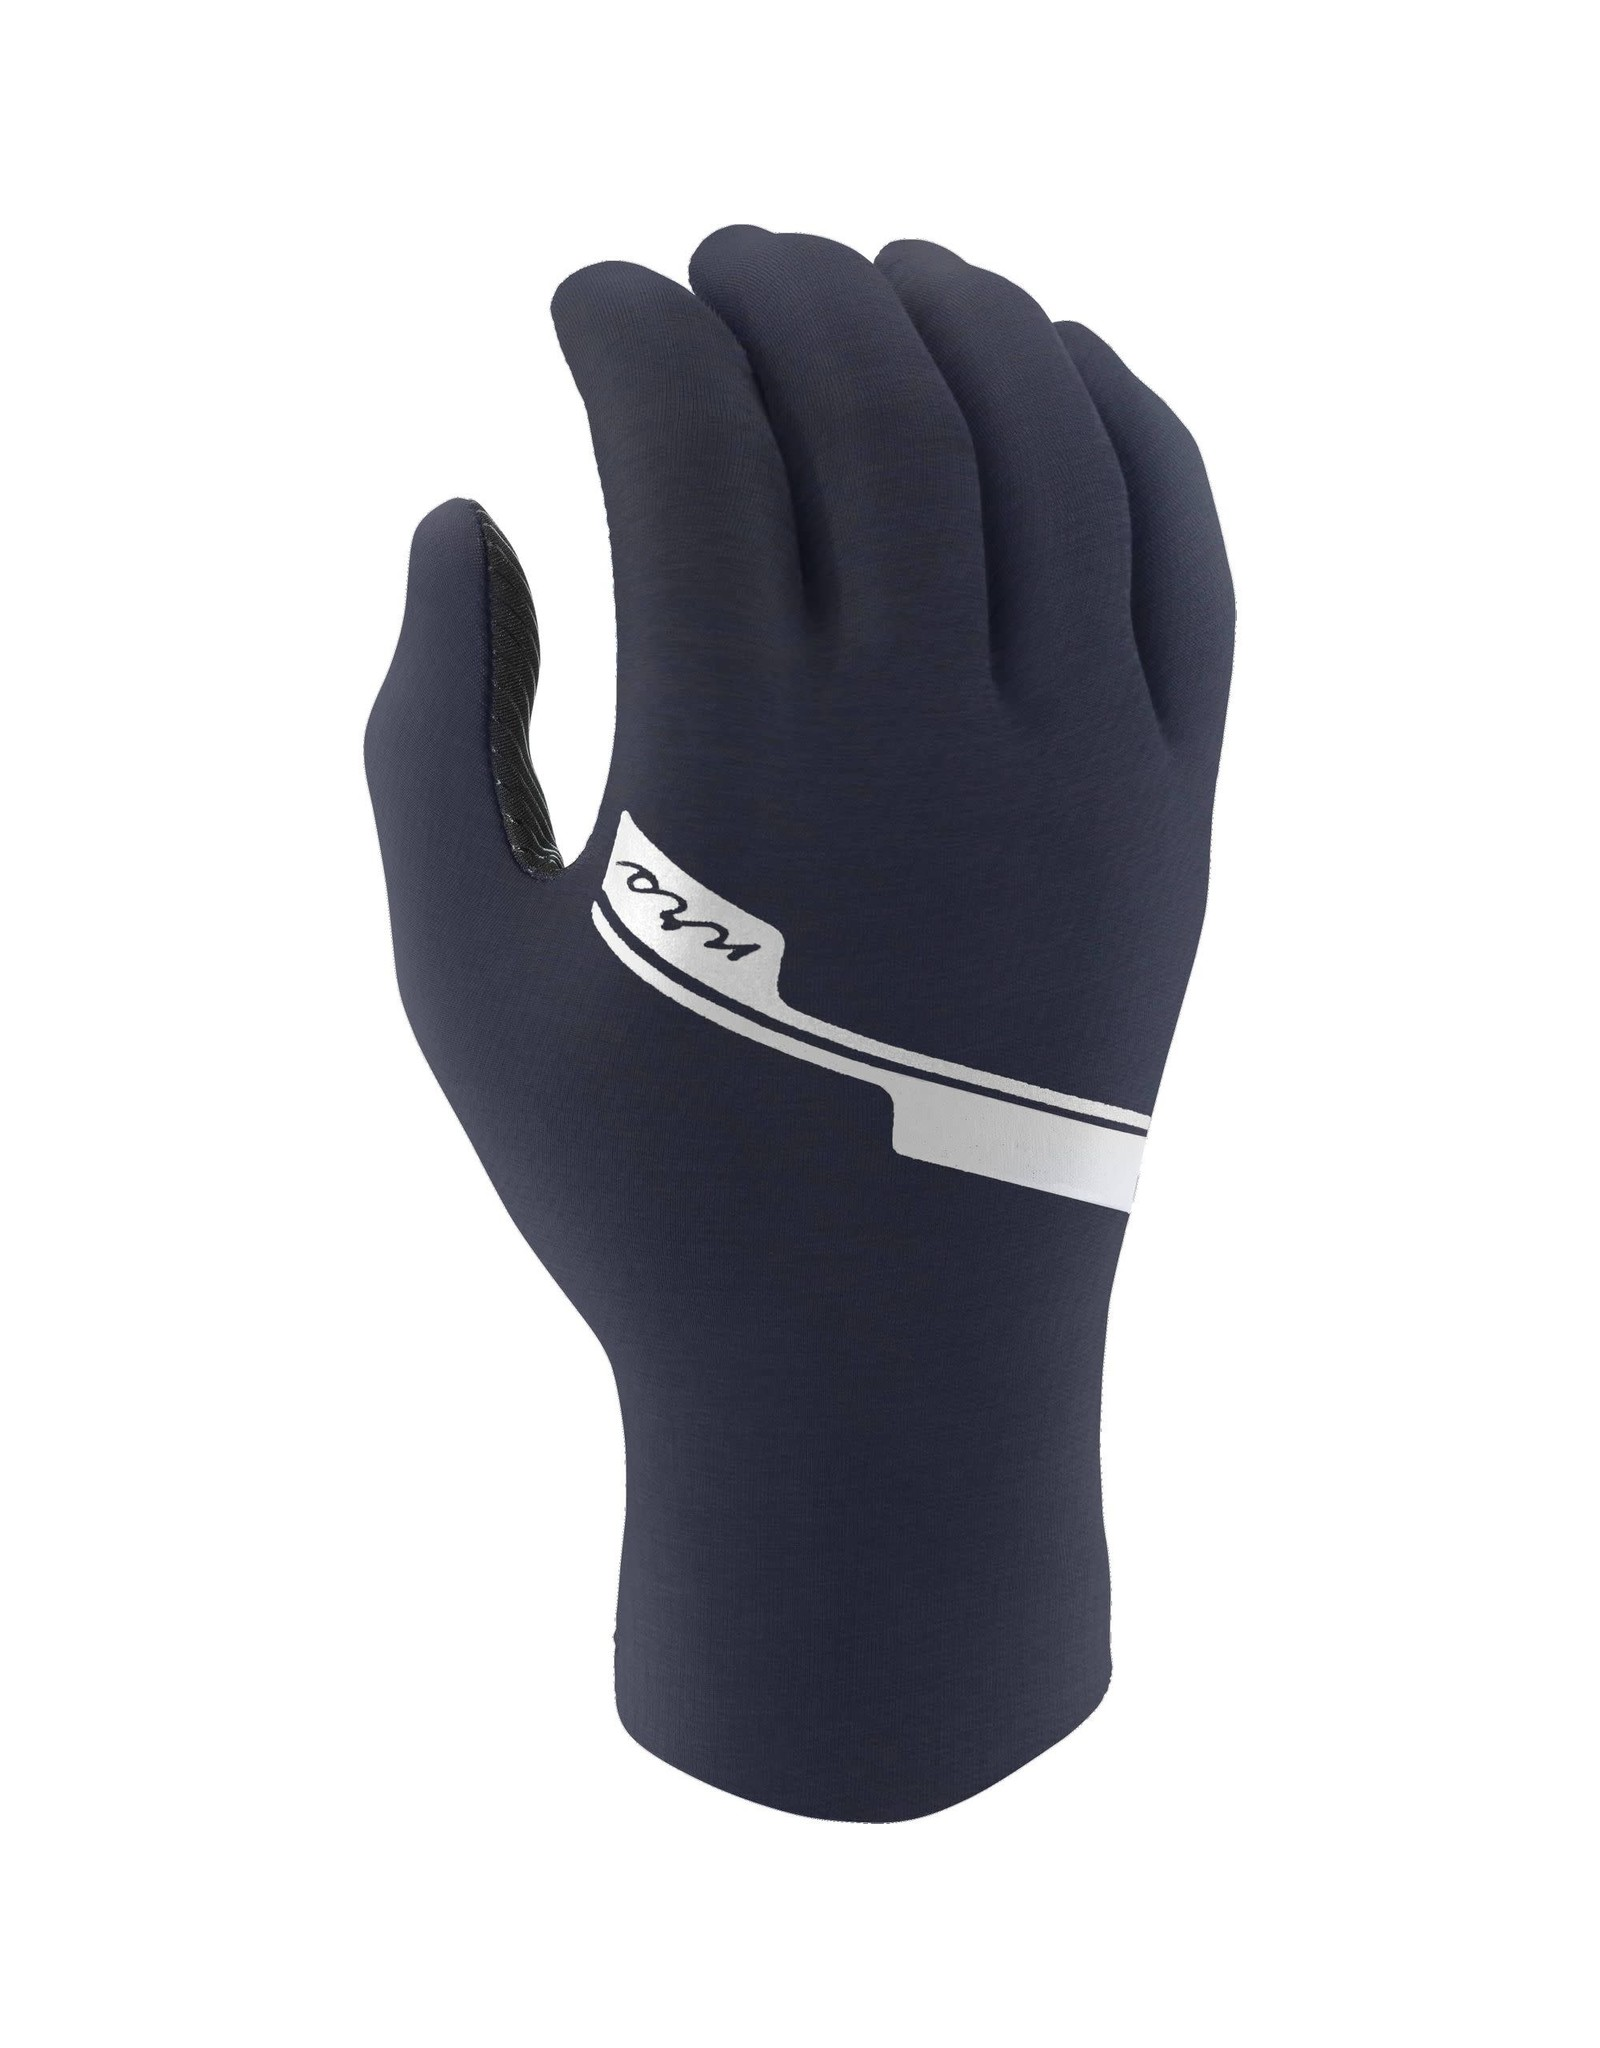 NRS NRS Women's HydroSkin Gloves